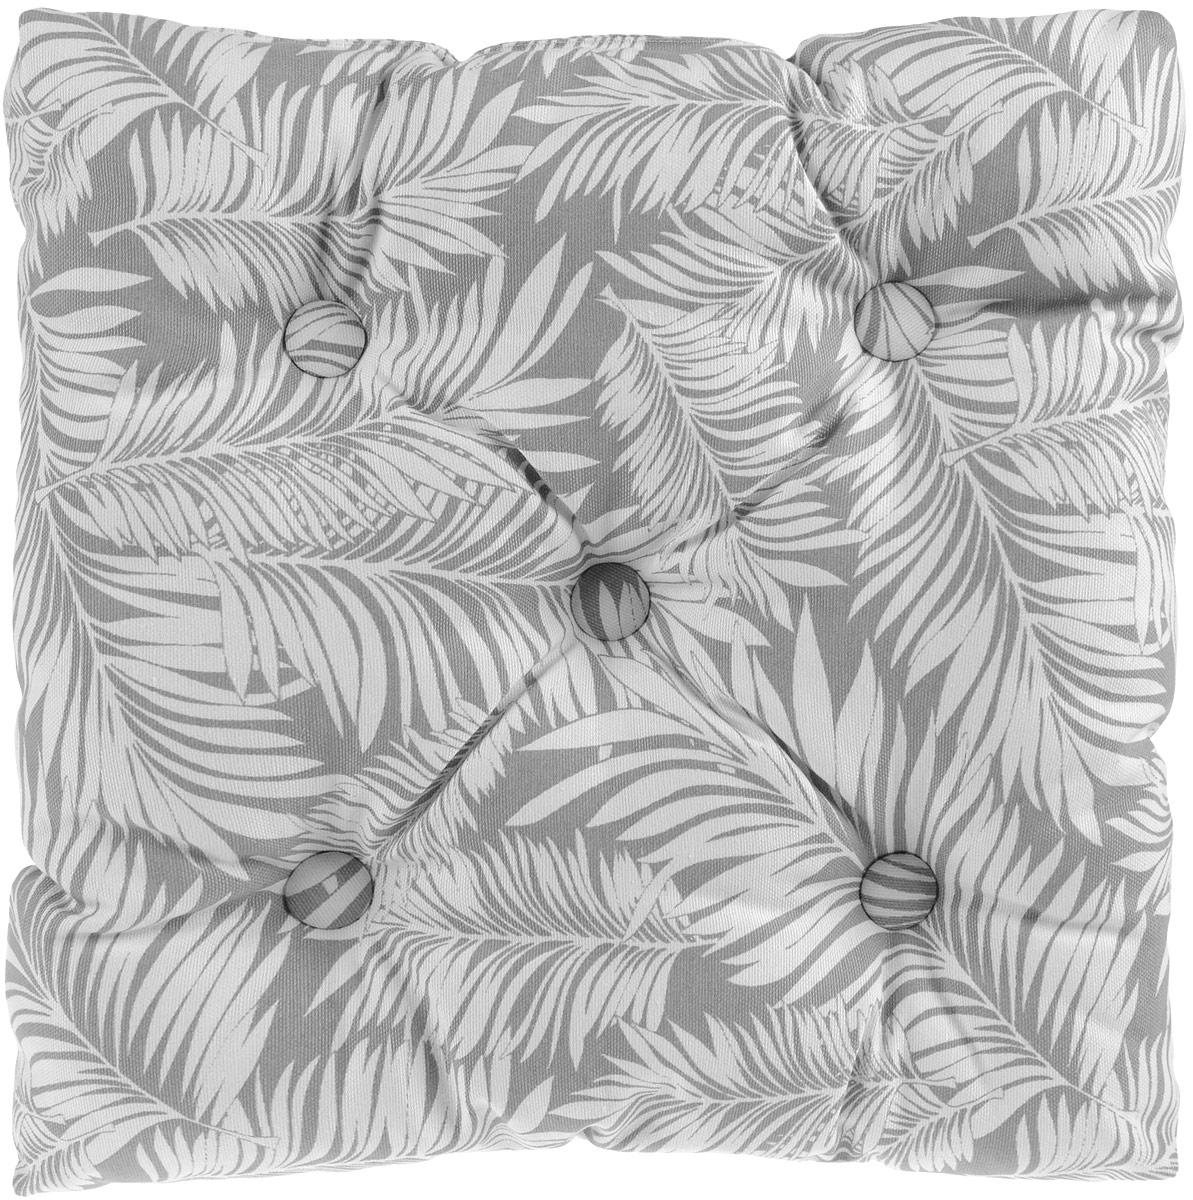 Подушка на стул KauffOrt Пальма, цвет: серый, 40 x 40 см